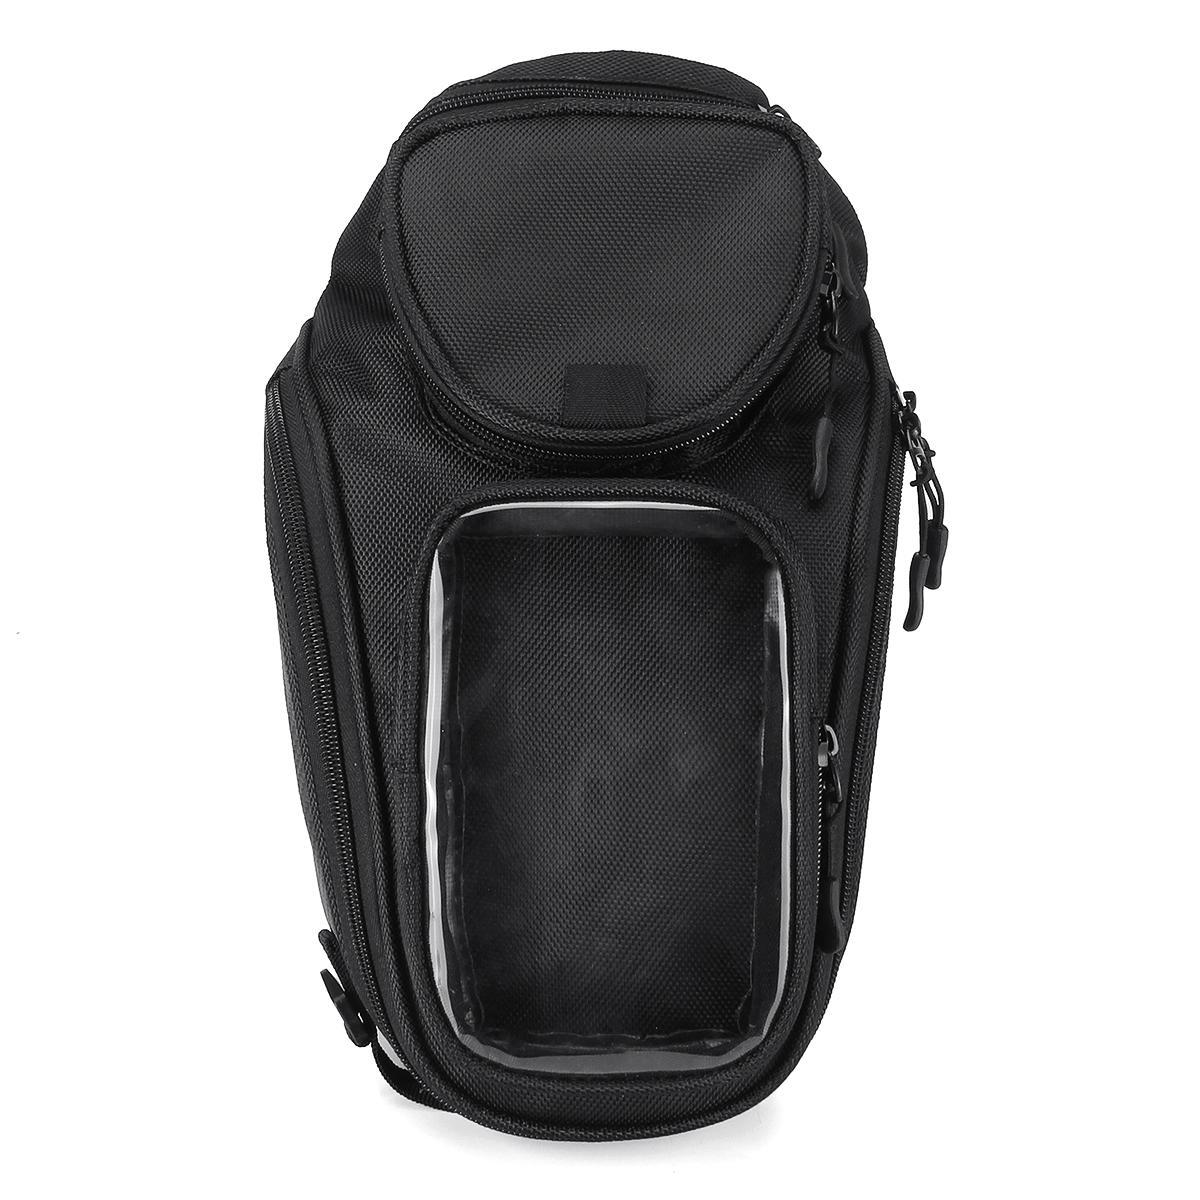 Oxford Waterproof Motorcycle Bike Bag Saddlebag Phone Holder Oil Tank Bag